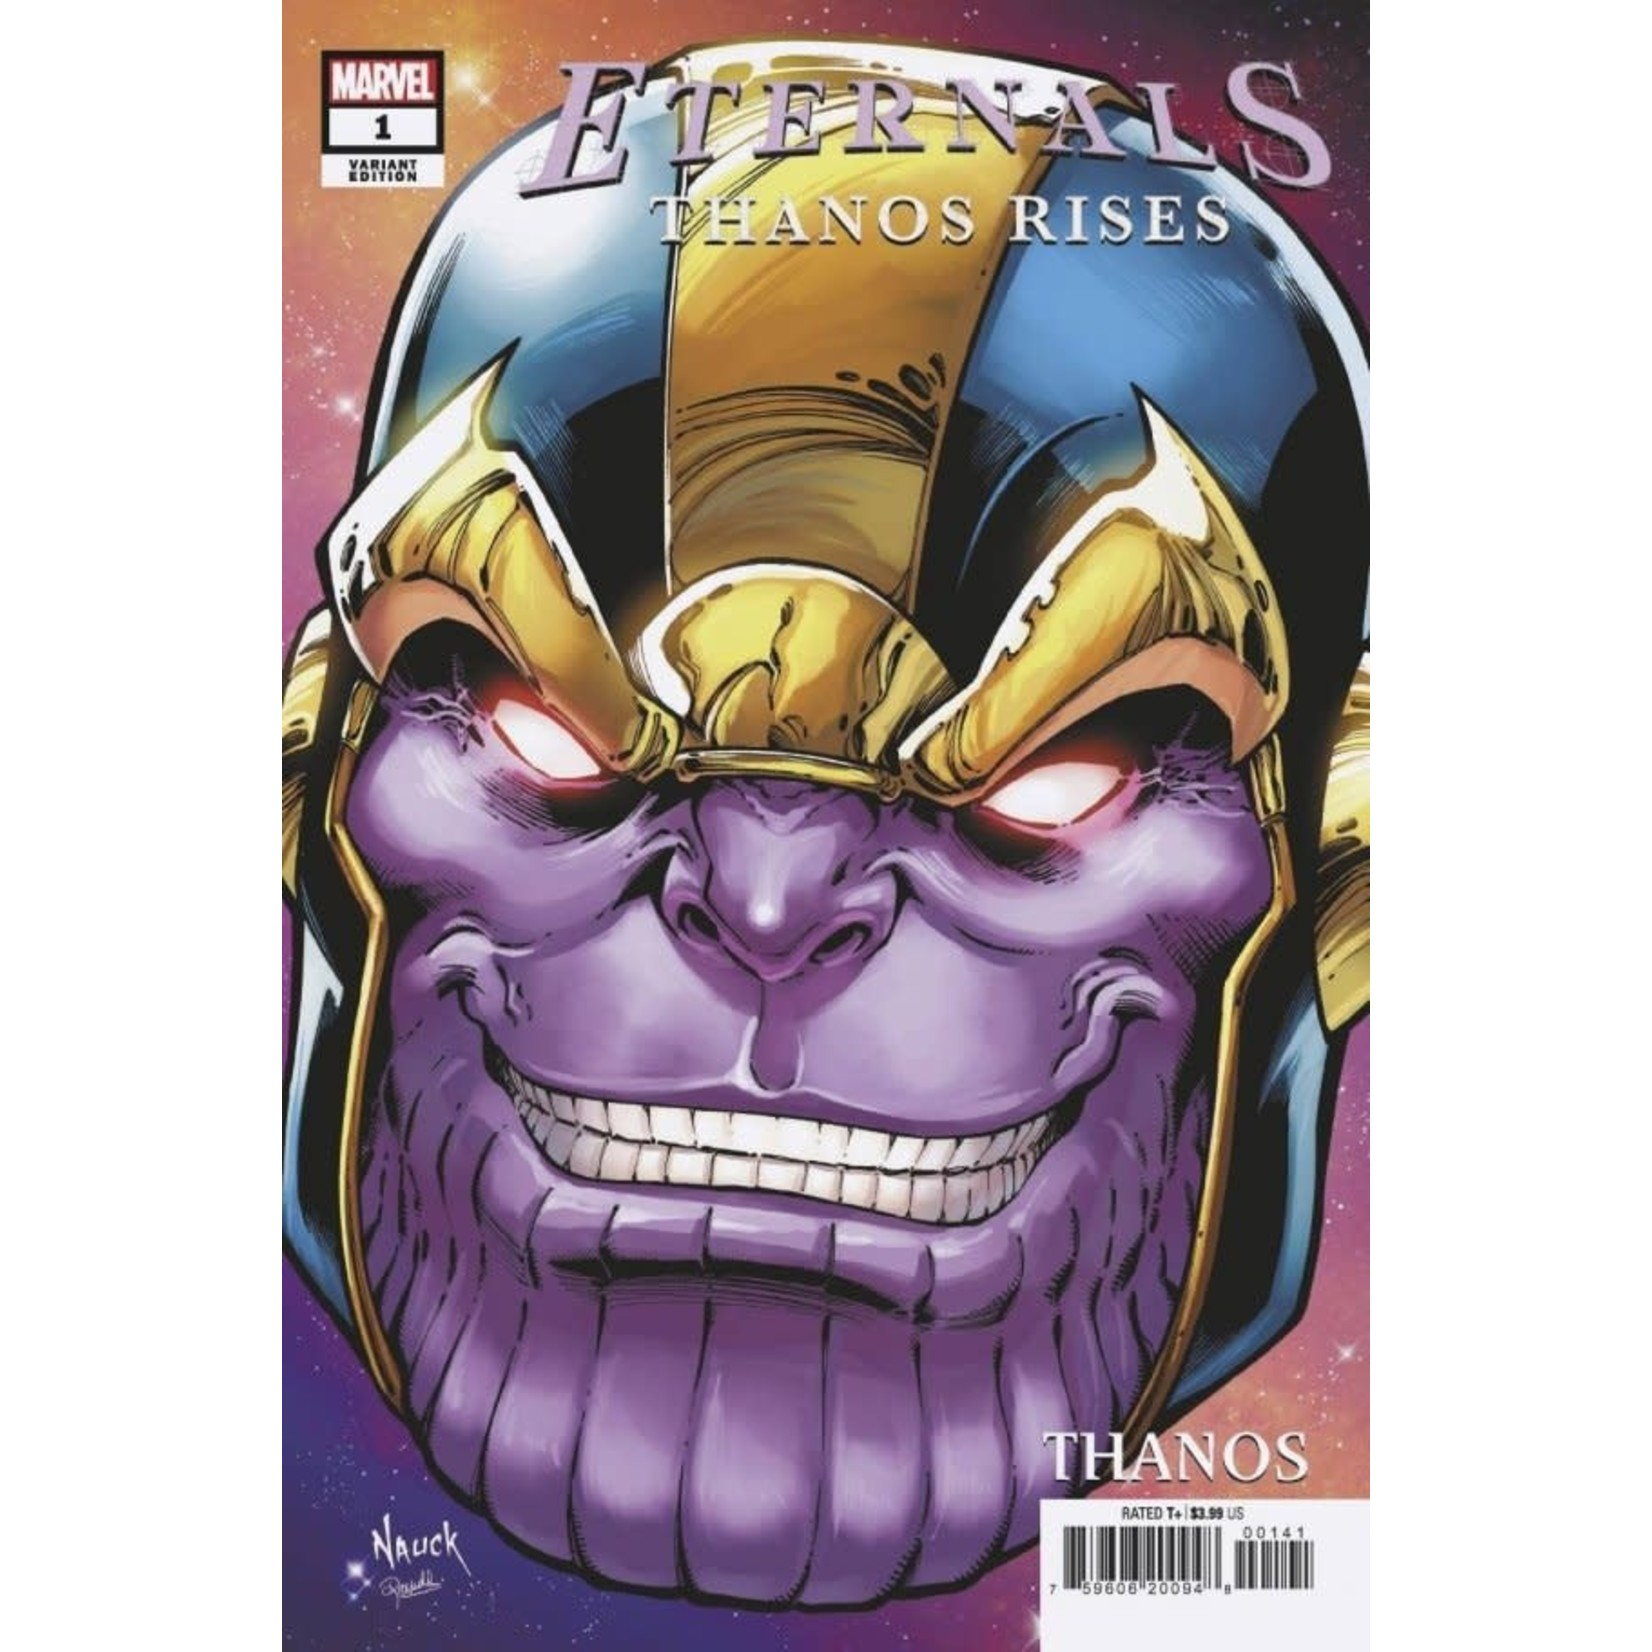 Eternals: Thanos Rises #1 Nauck Headshot Variant